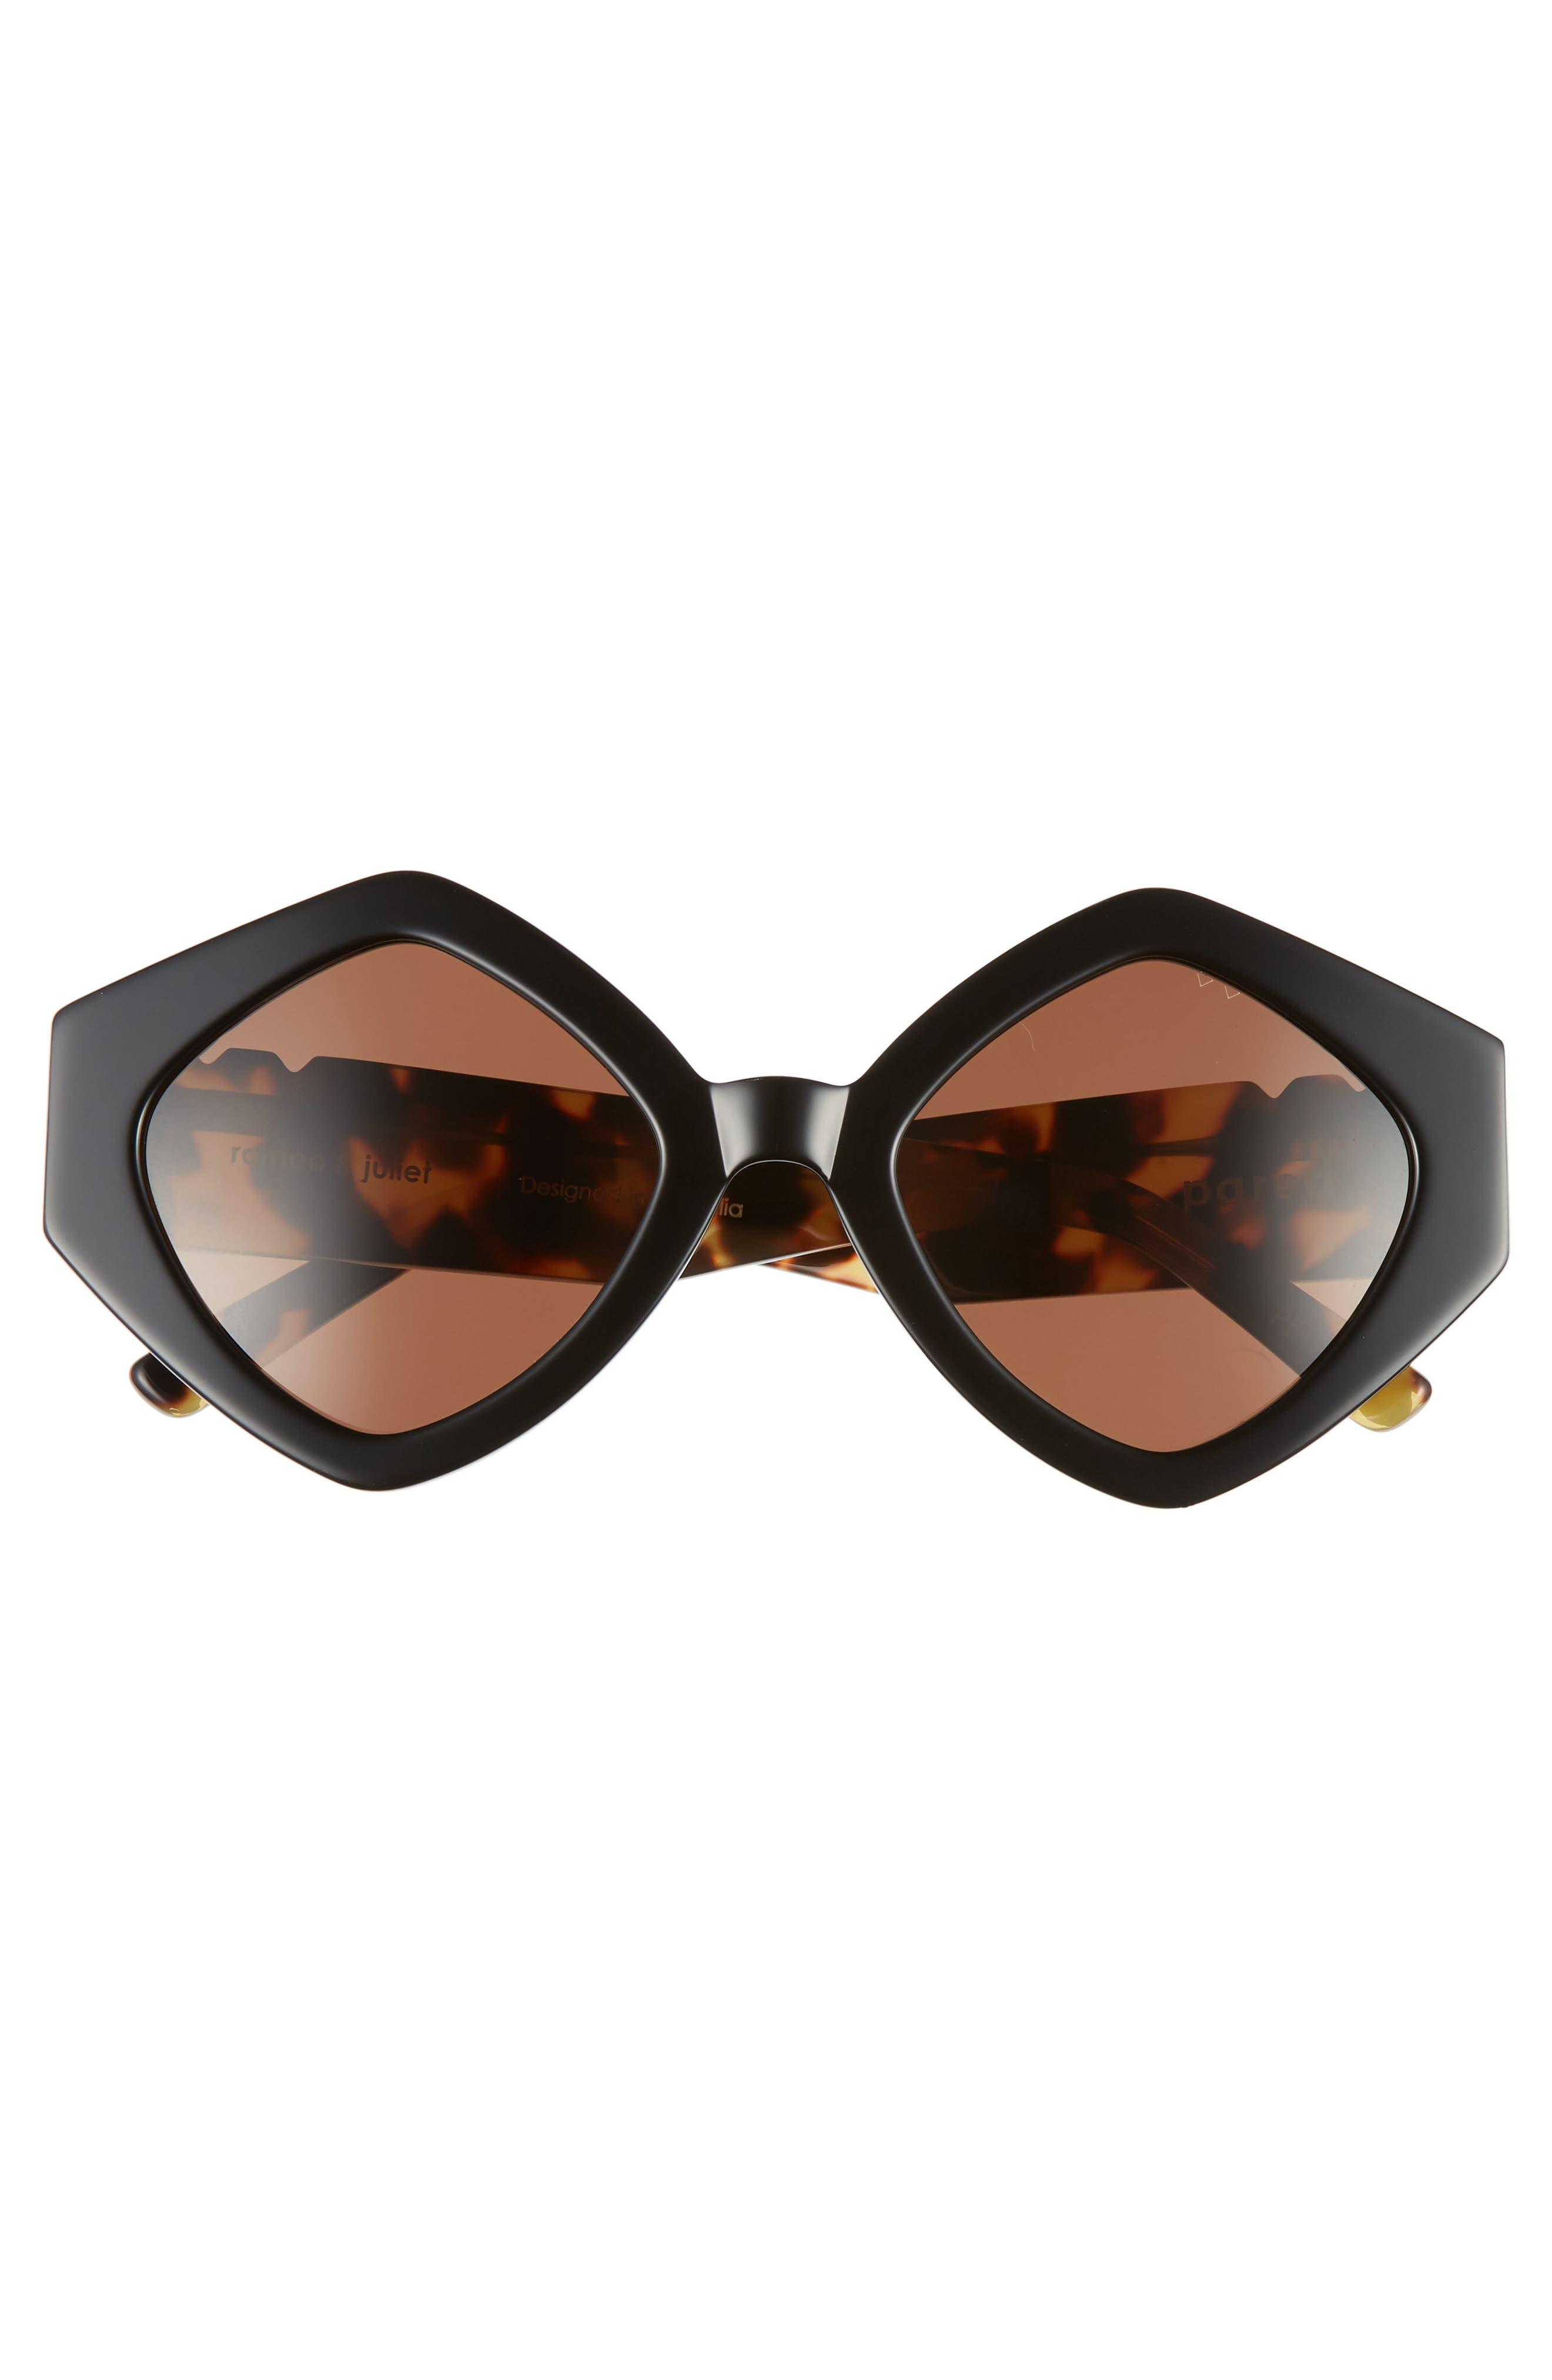 Romeo & Juliet 52mm Sunglasses,                             Alternate thumbnail 3, color,                             BLACK SOLID BROWN LENSES